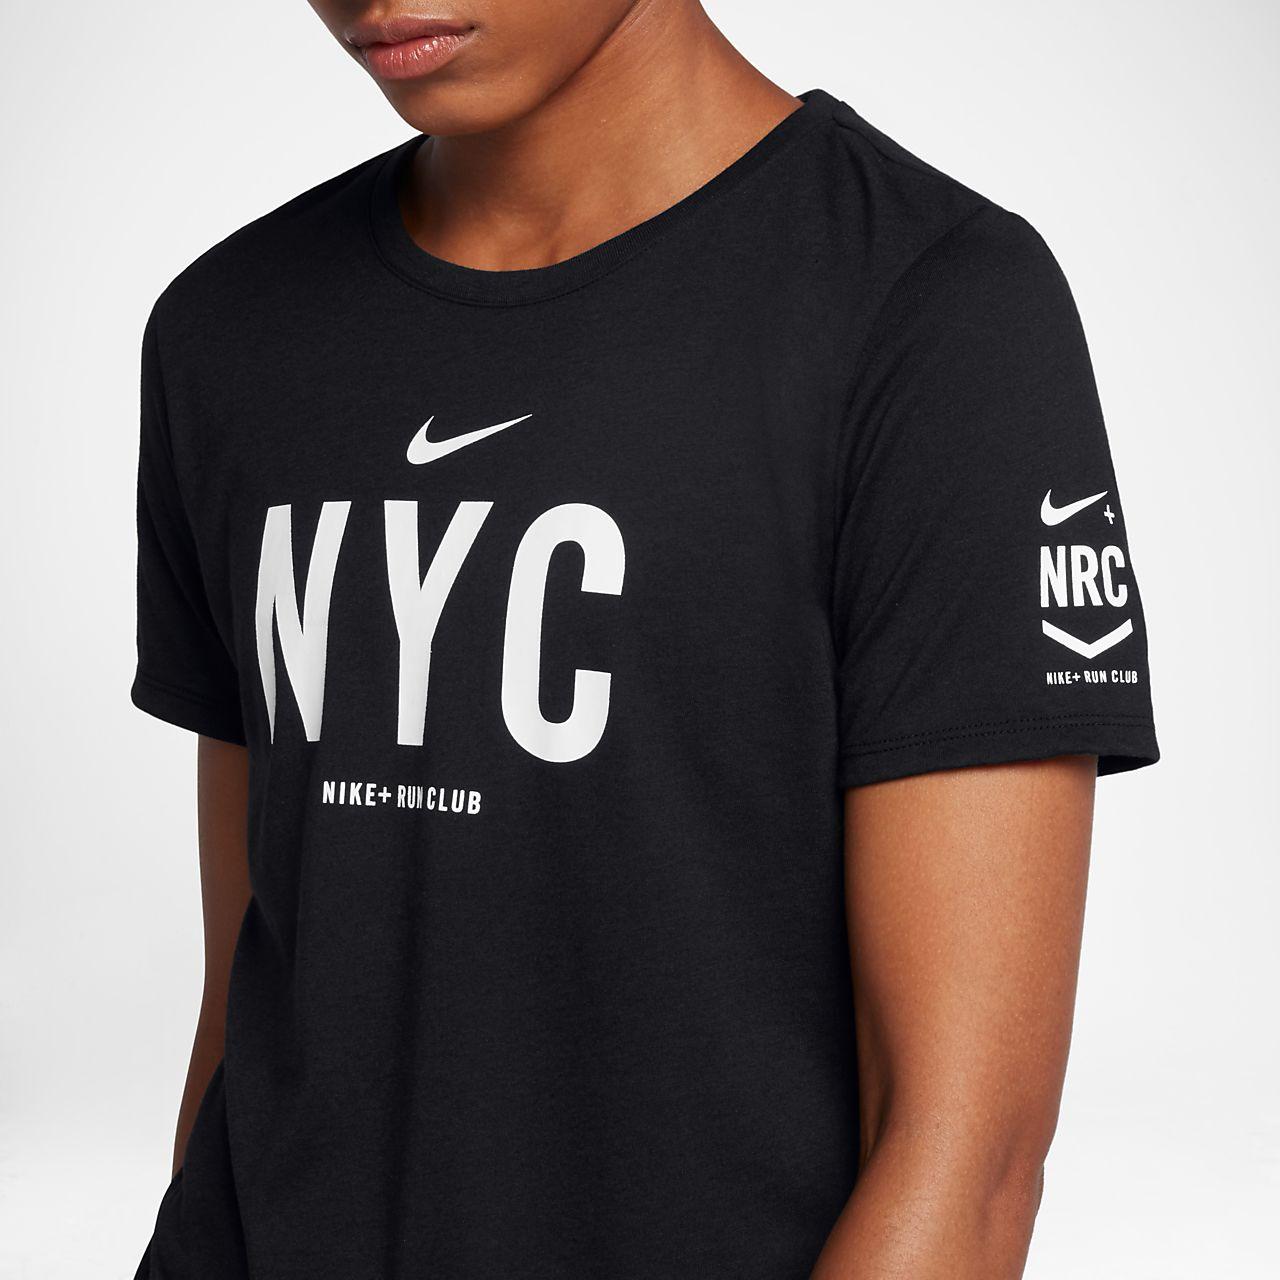 Nike Dri Fit Nrc Nyc Women 39 S Running T Shirt Hr